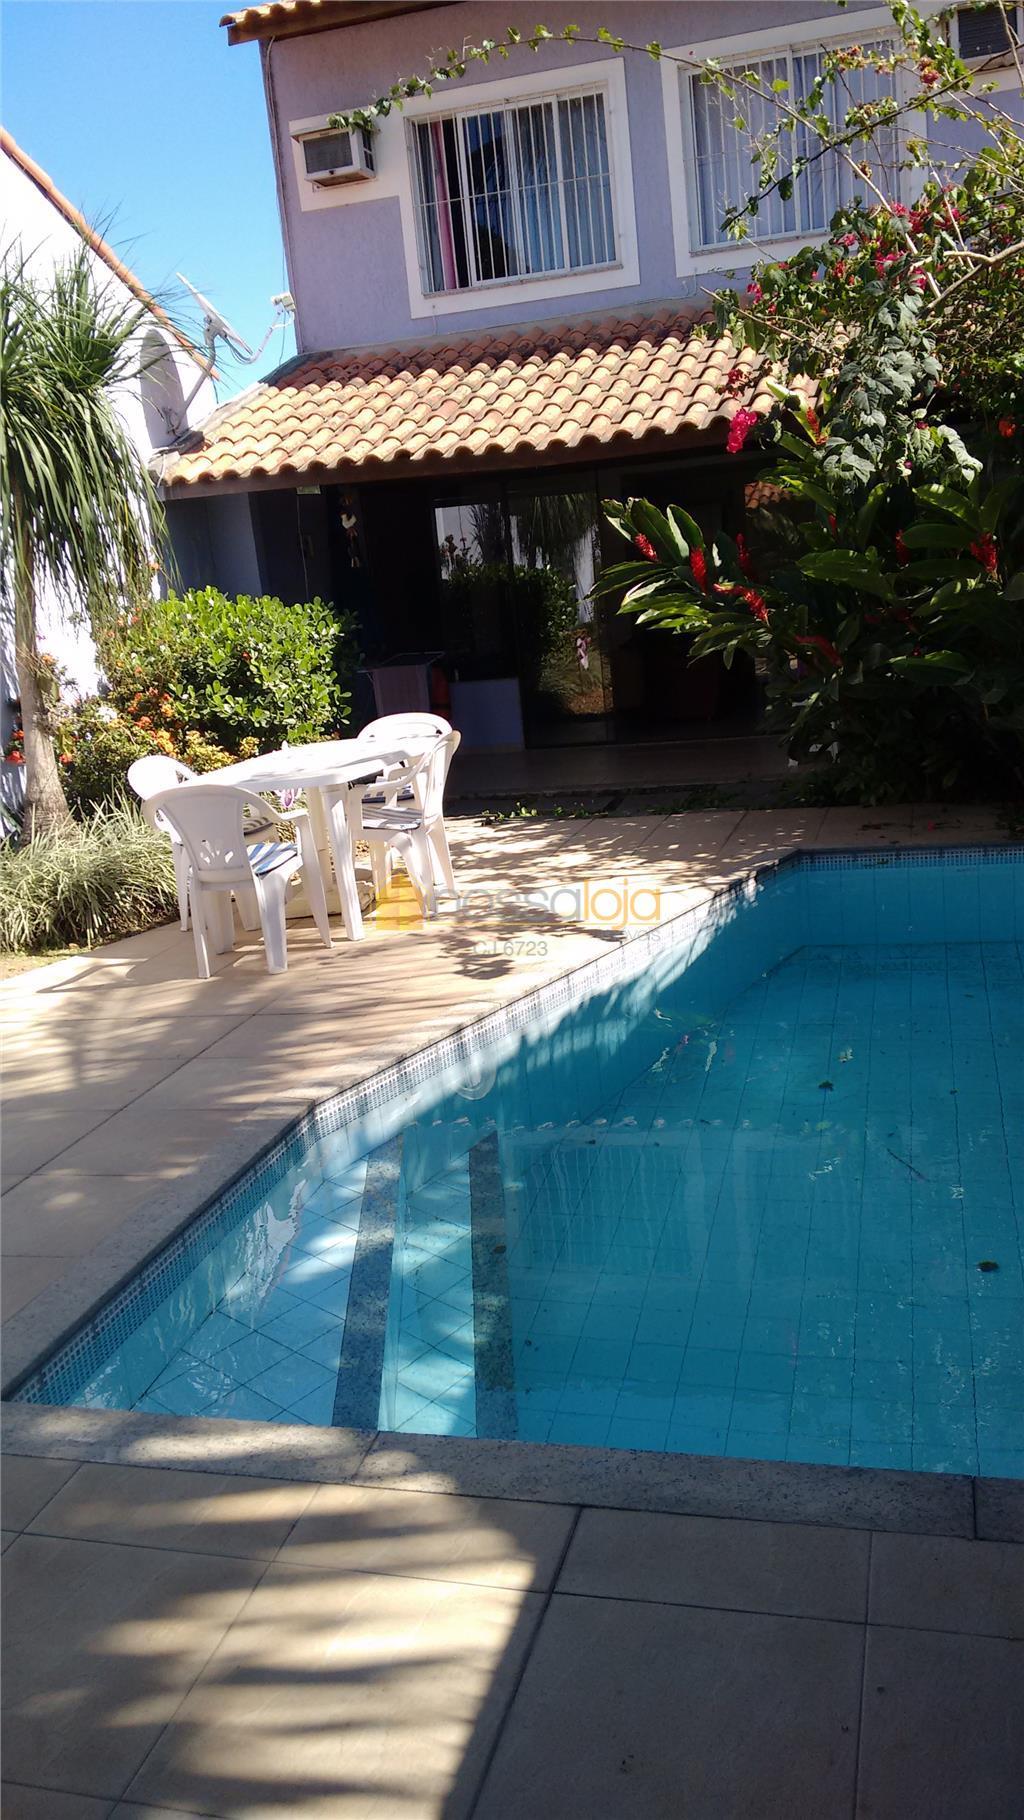 Piratinga - Maralegre - Casa Duplex - 3 Quartos - 1 Suite - Varanda - Piscina - Churrasqueira - 2 Vagas